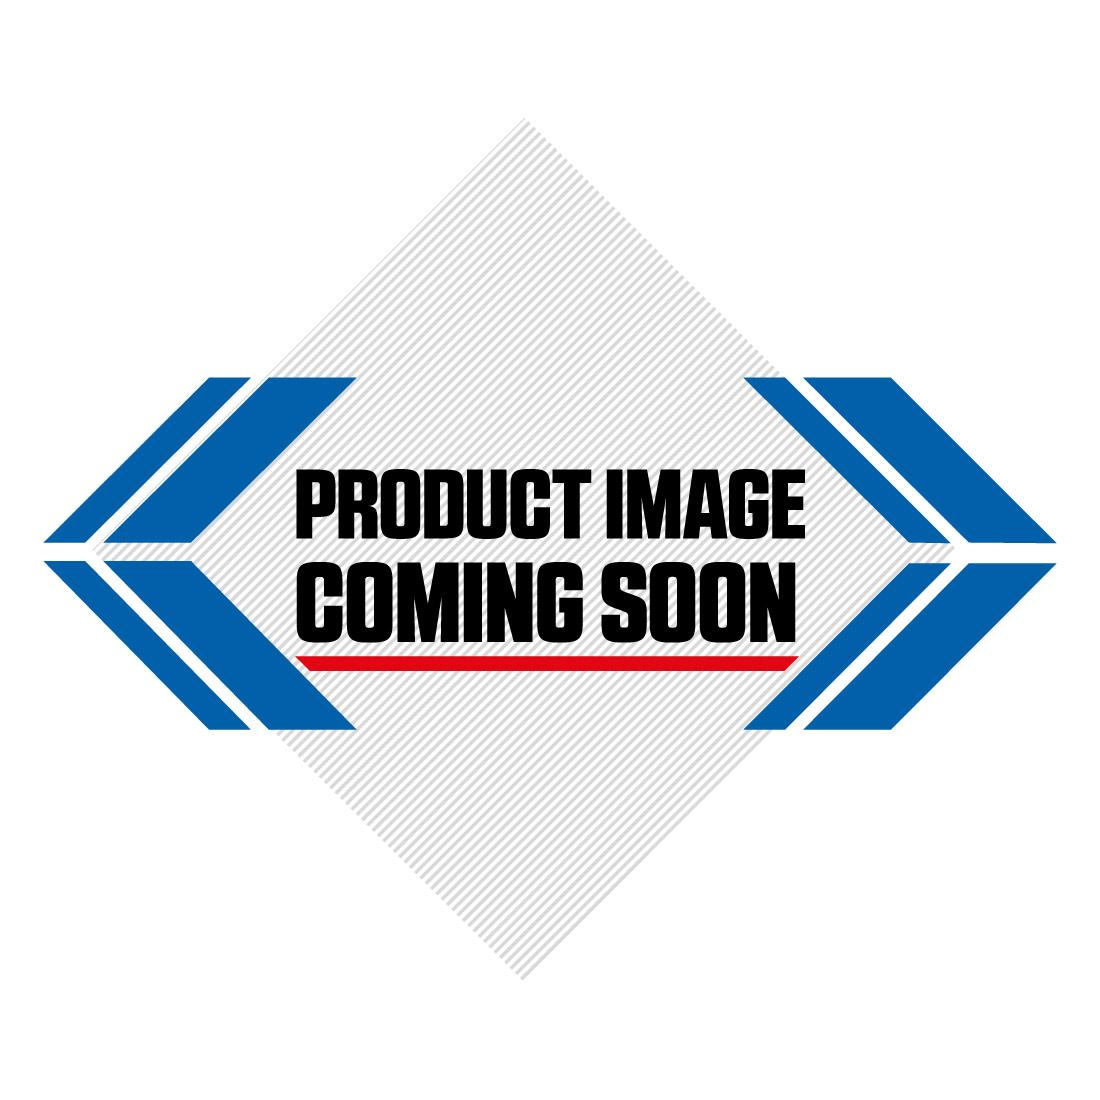 Suzuki Plastic Kit Suzuki RMZ 450 (08-17) White Image-5>